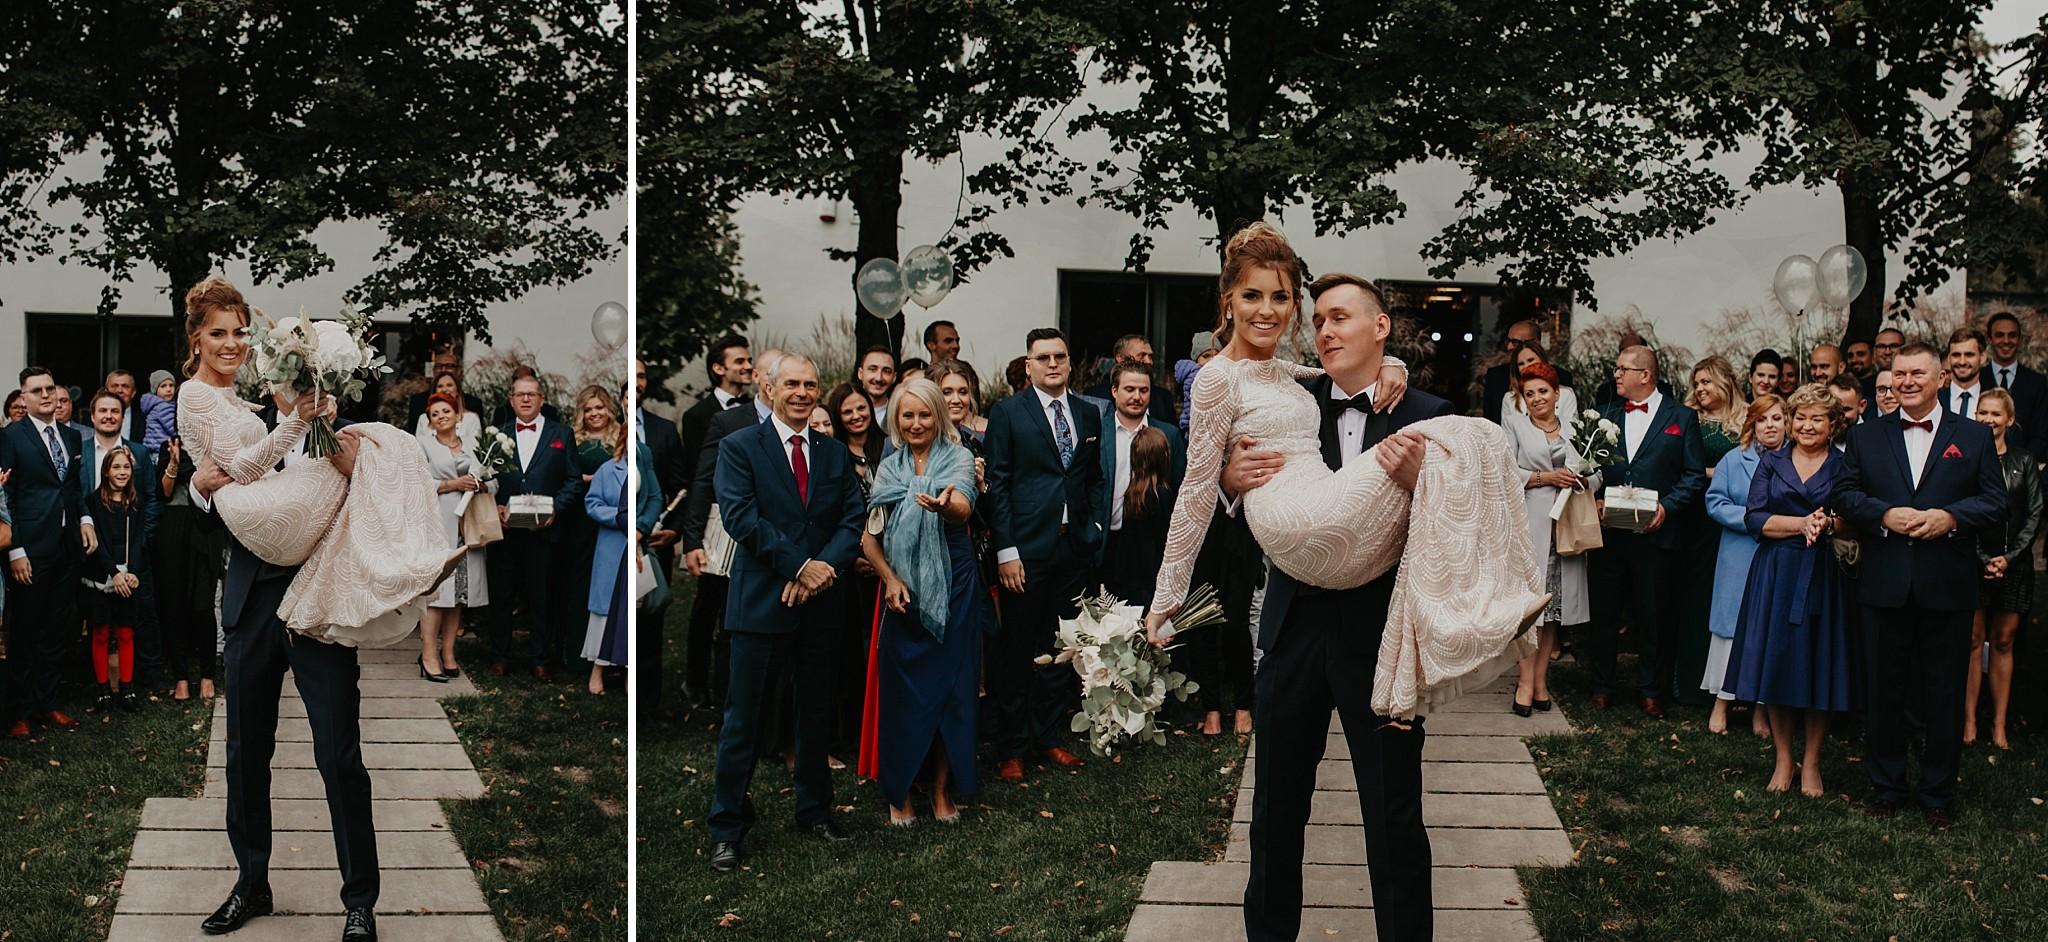 fotograf poznan wesele dobra truskawka piekne wesele pod poznaniem wesele w dobrej truskawce piekna para mloda slub marzen slub koronawirus slub listopad wesele koronawirus 264